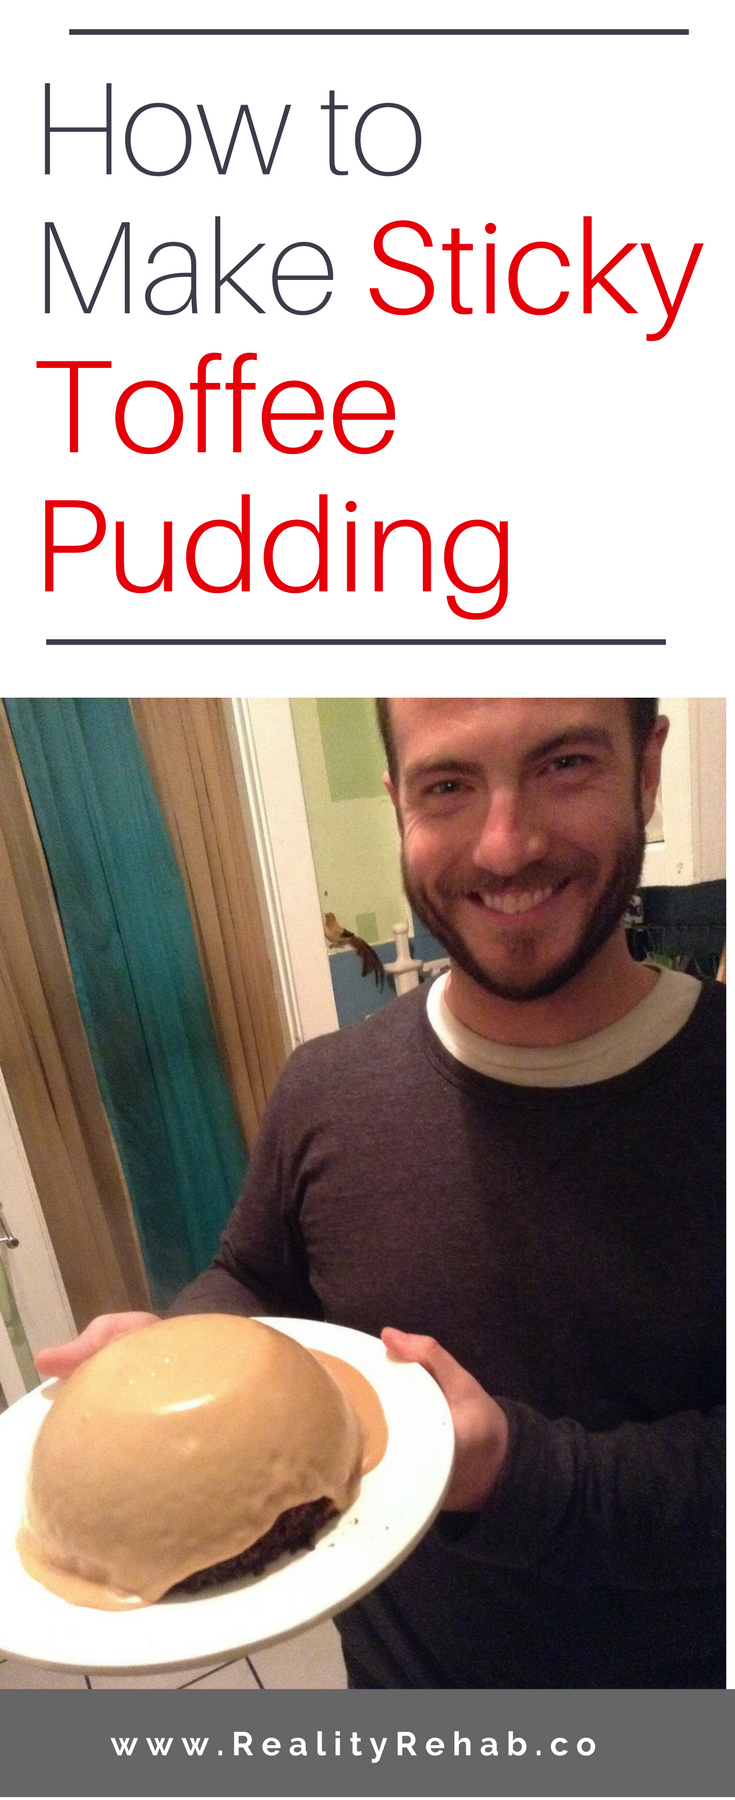 How to Make Sticky Toffee Pudding | Cock & Crow Blog #stickytoffeepudding #recipe #british